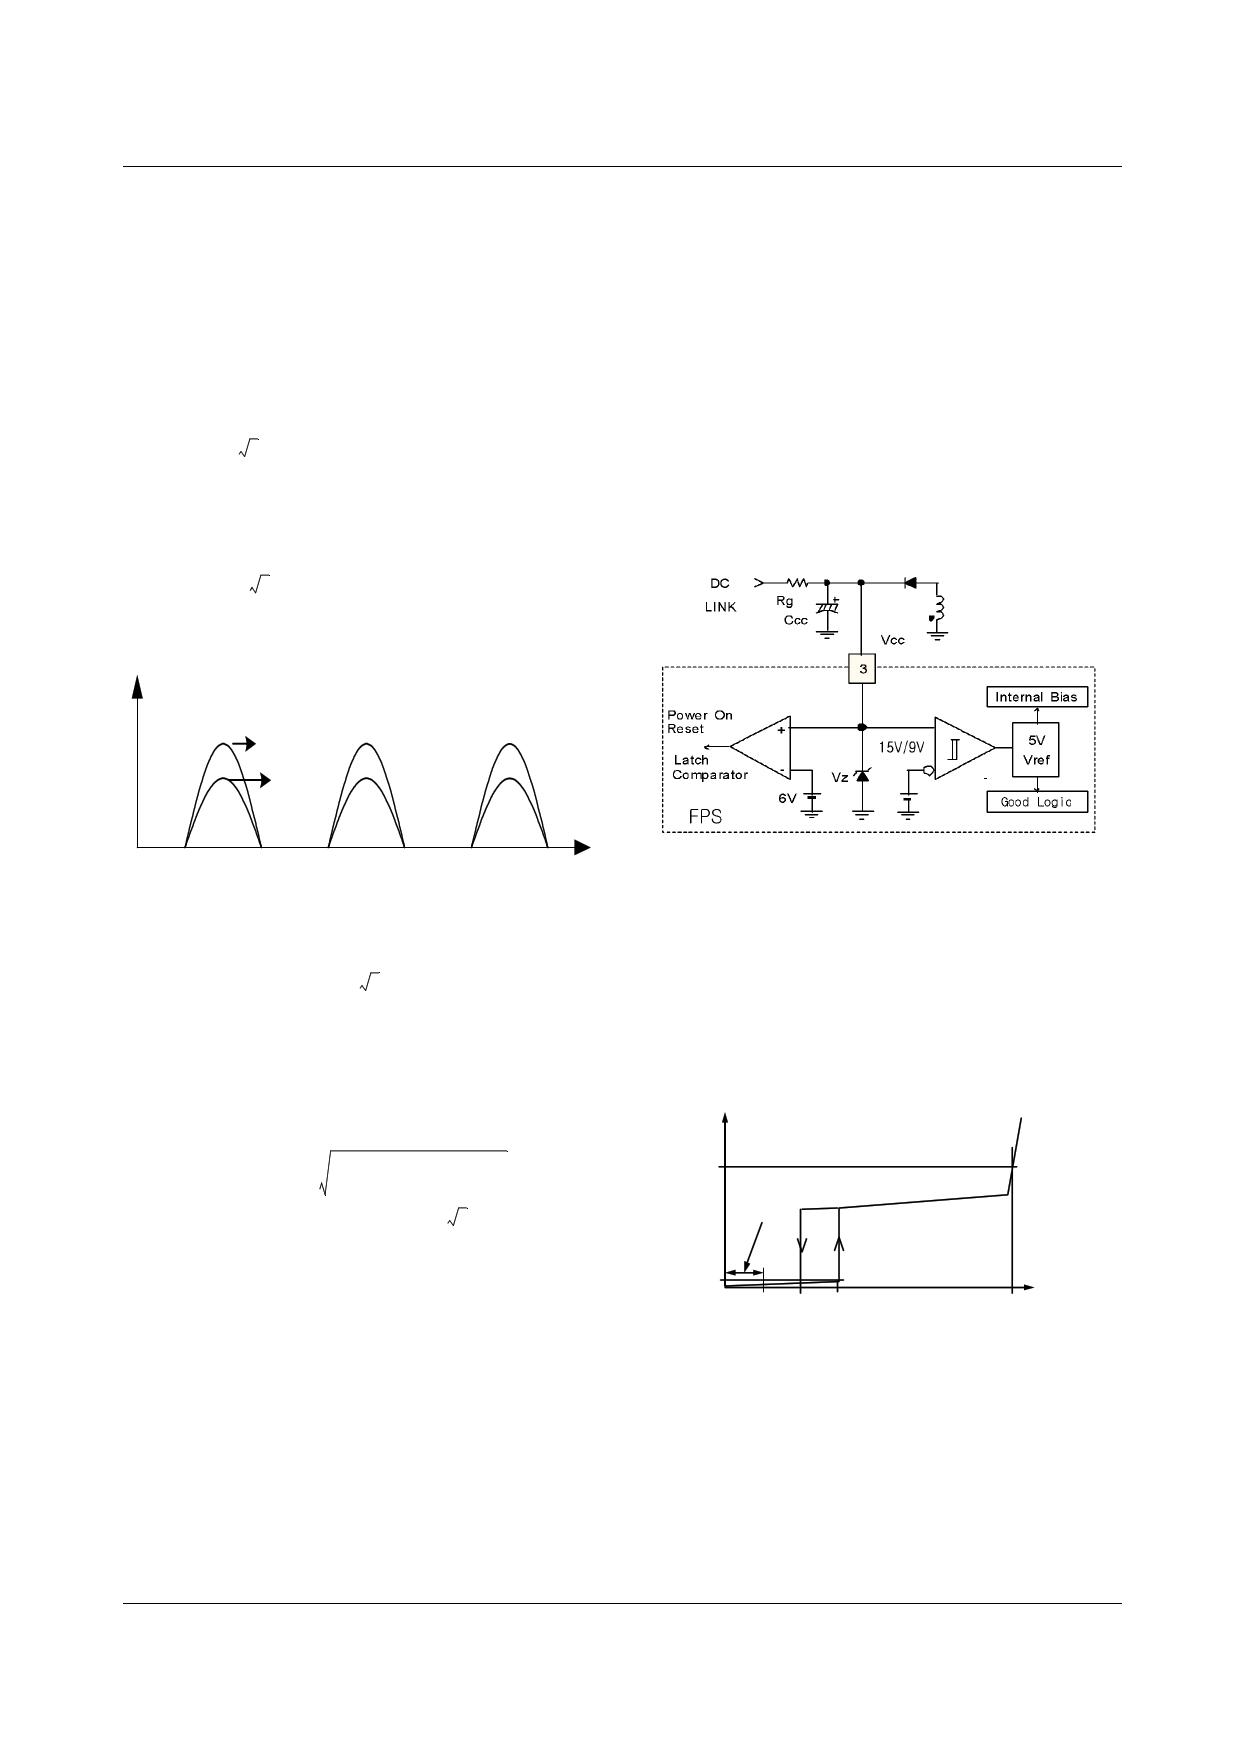 FS7KM-5 pdf